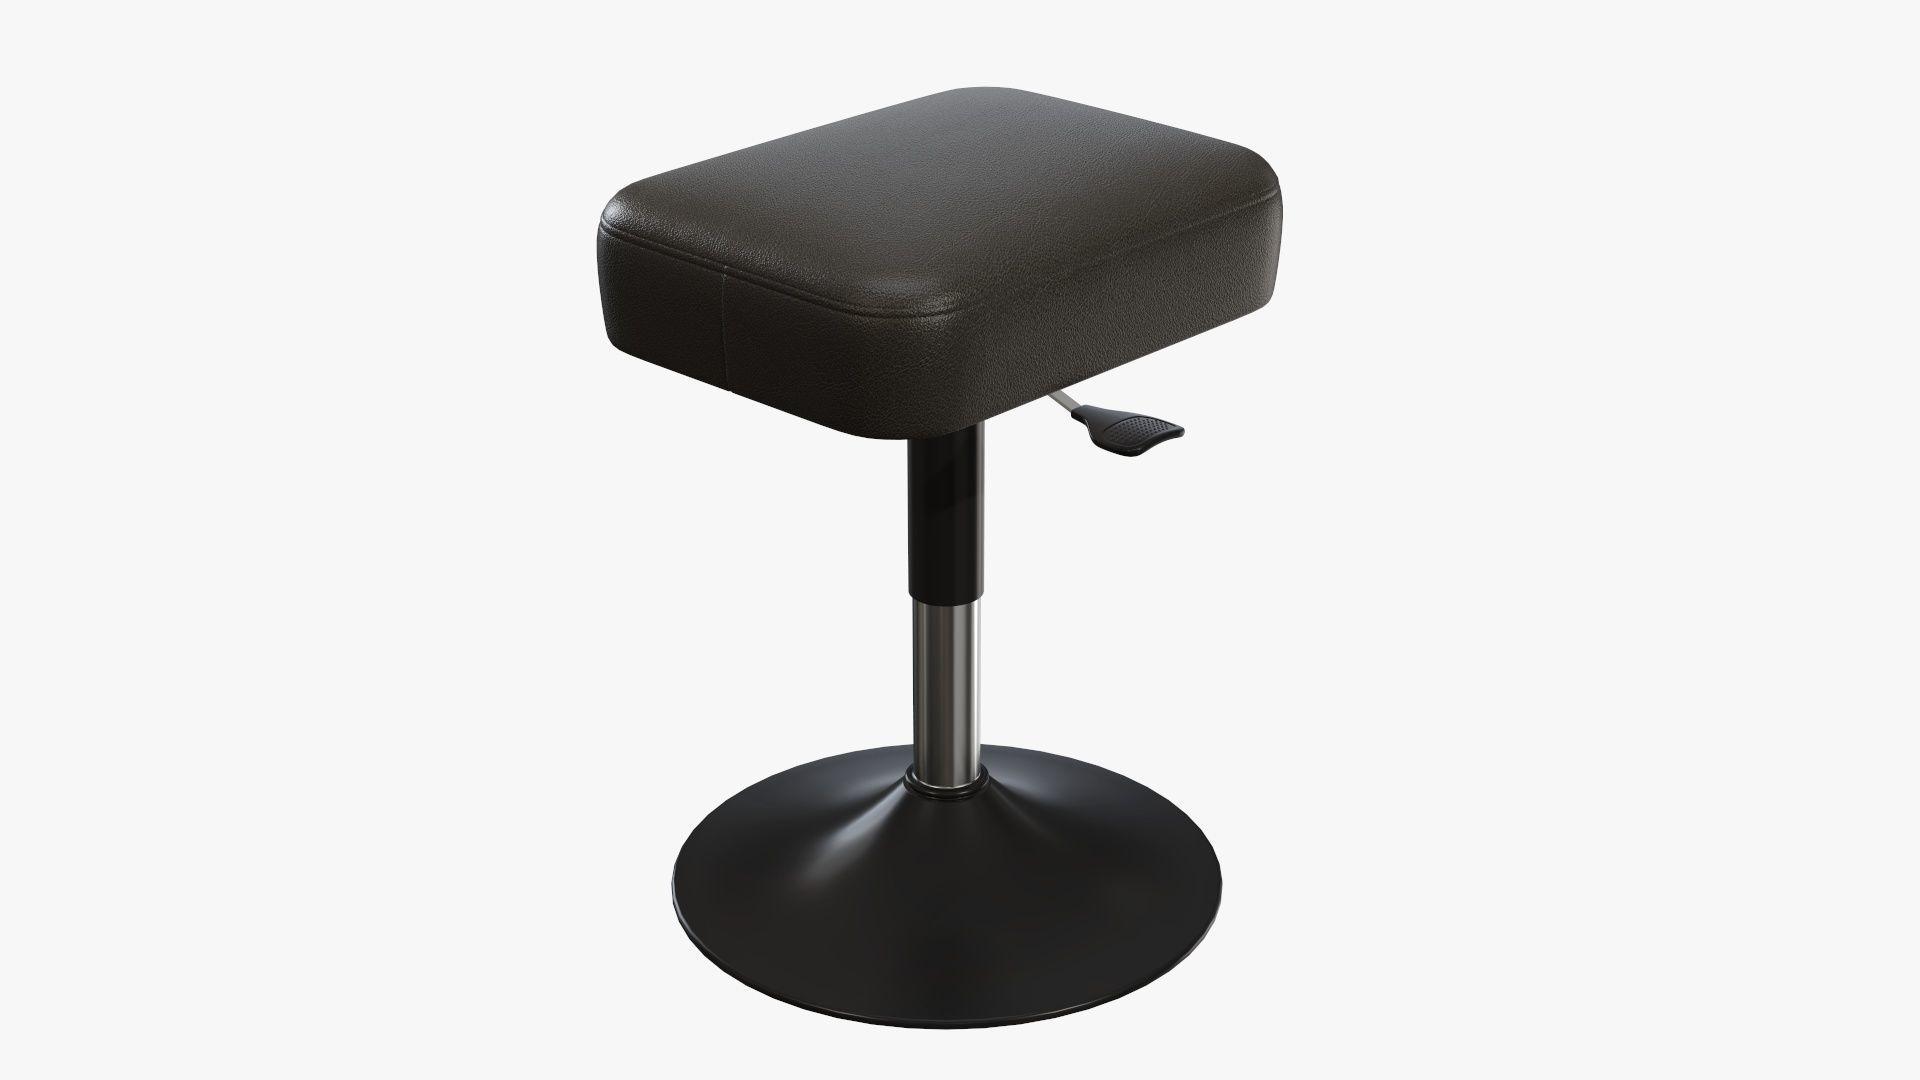 Piano stool adjustable 01